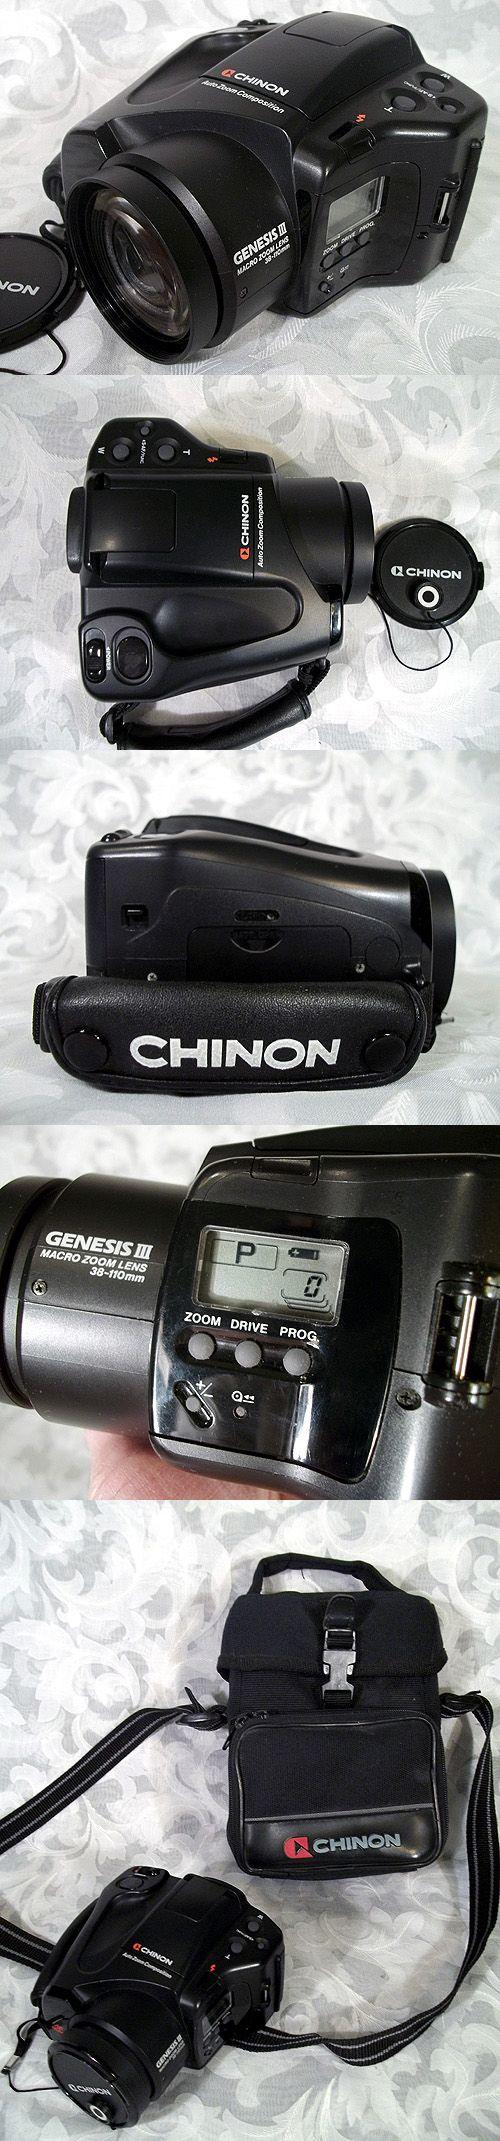 $120.00 or best offer Vintage 1980's CHINON GENESIS III SLR Camera Made in Japan w Original Case